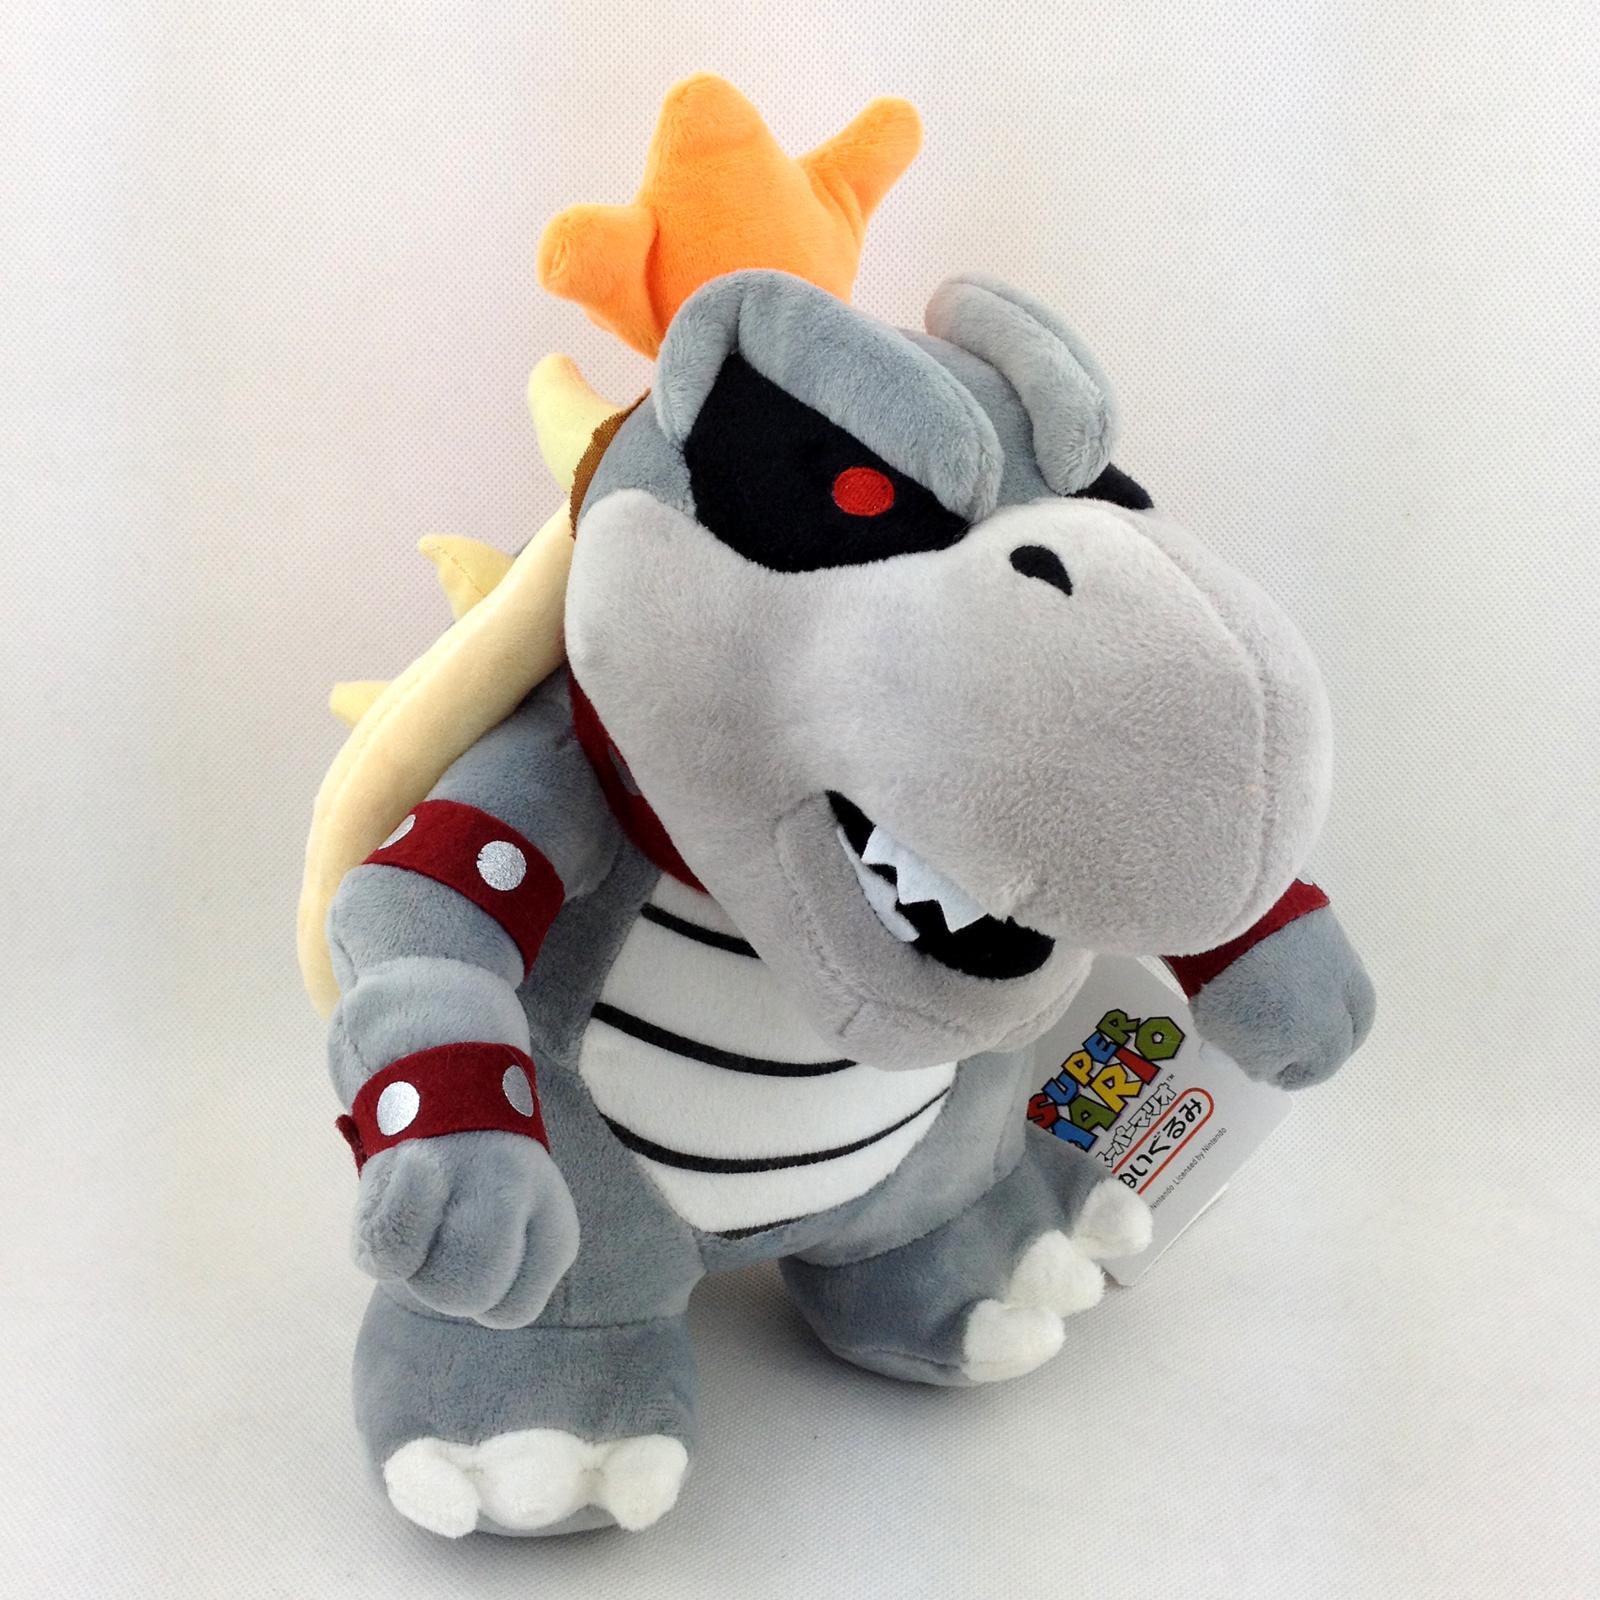 2018 Dry Bowser Super Mario Bros Bones Koopa Troopa Soft ...